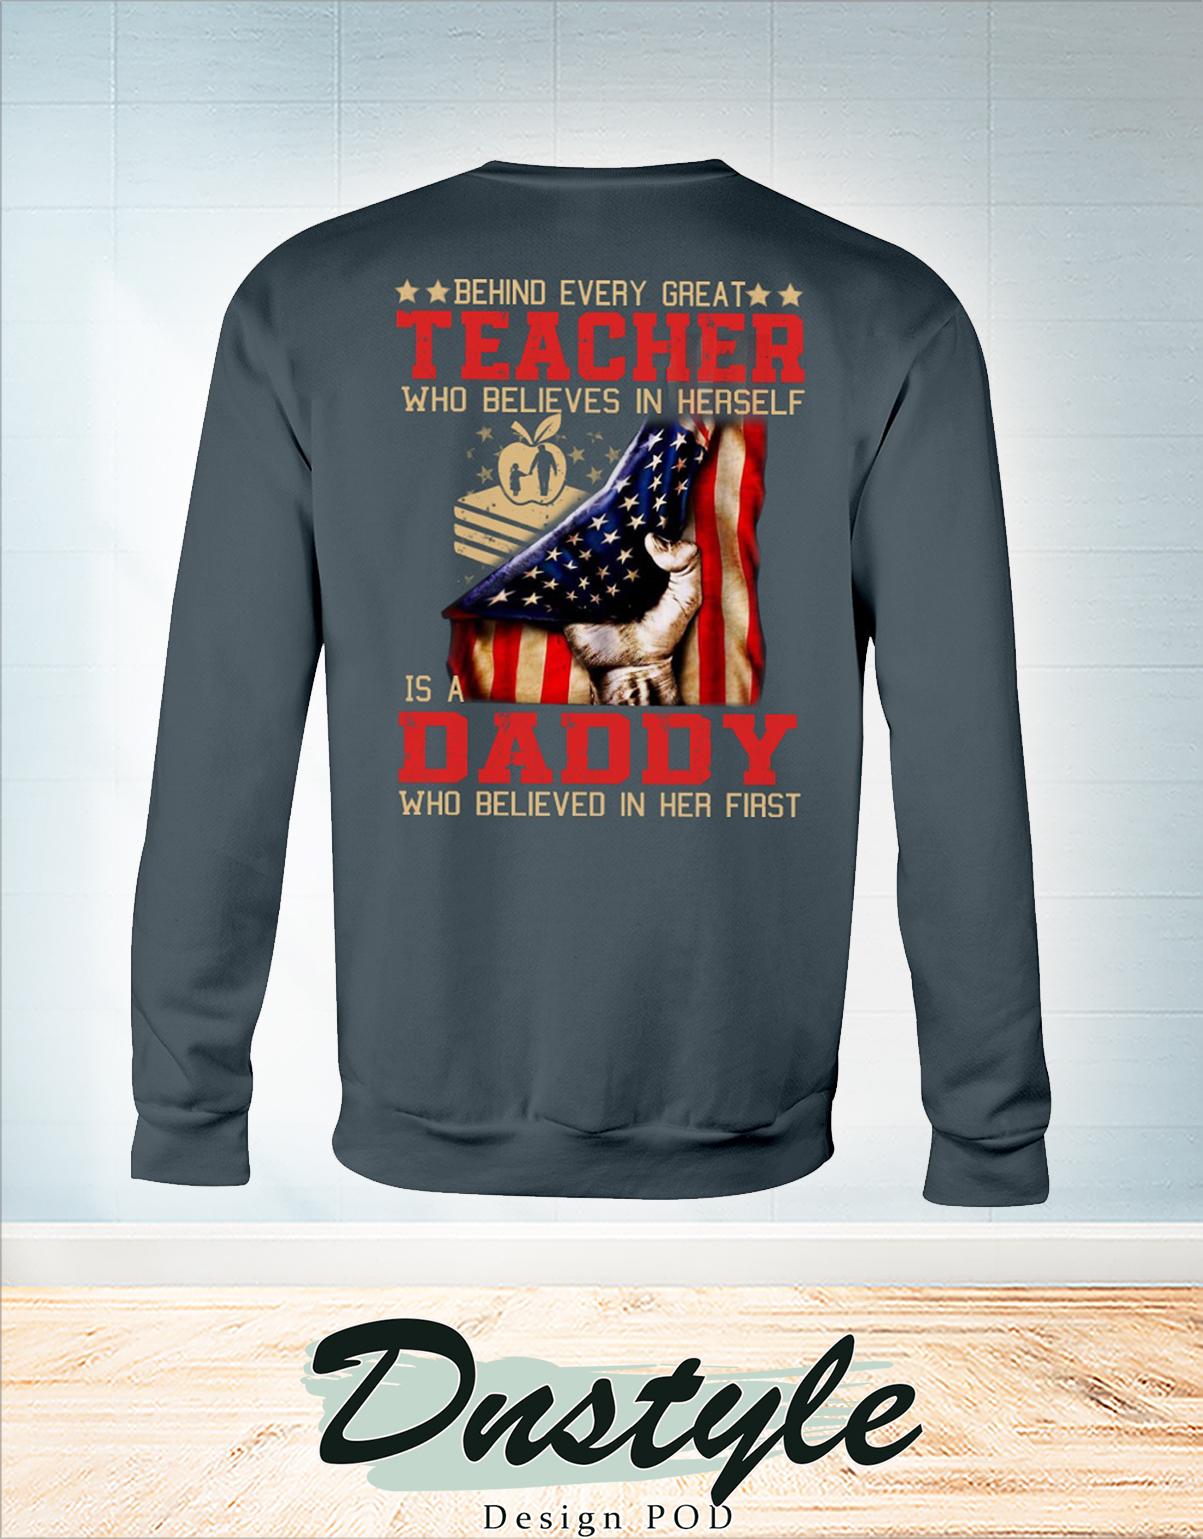 Behind every great teacher who believes in herself is a daddy sweatshirt